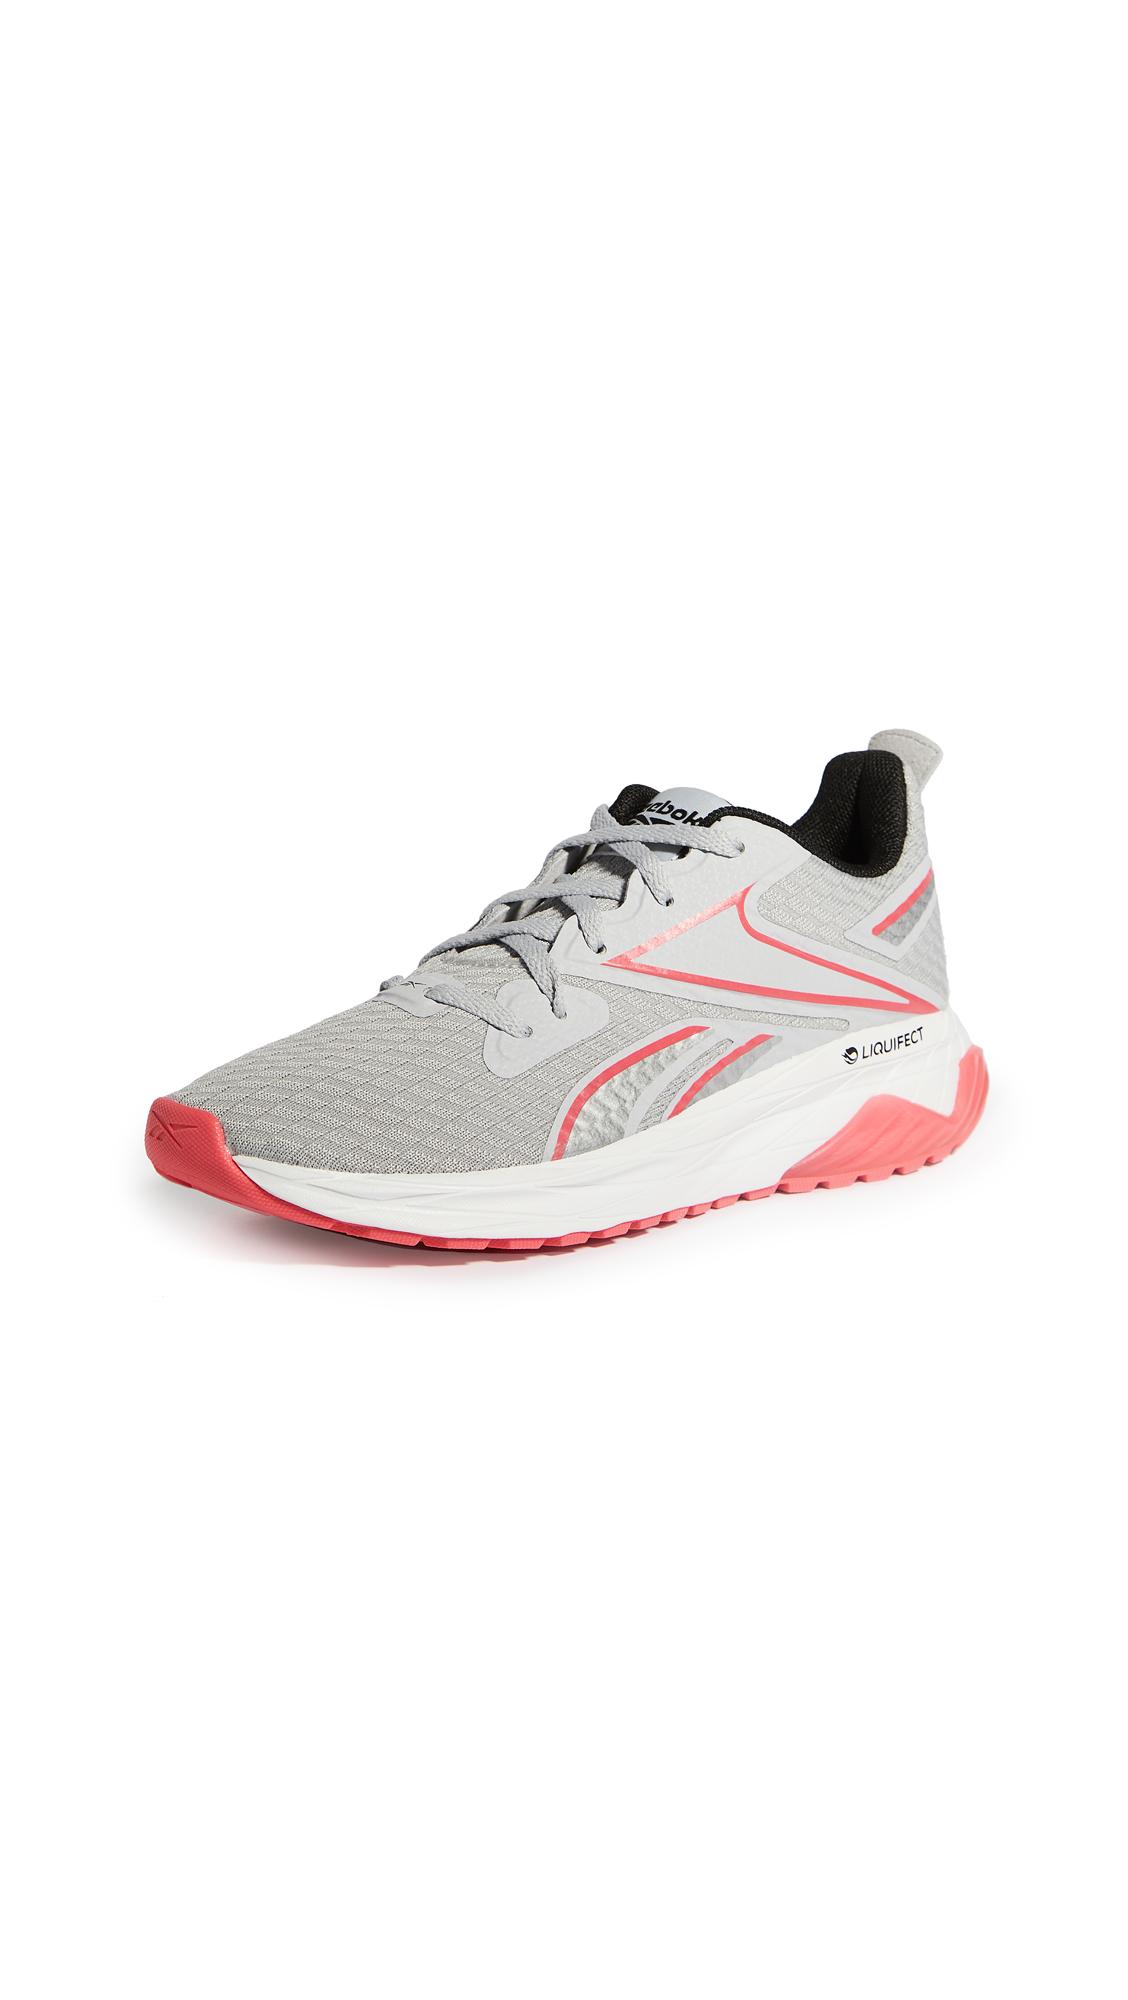 Reebok Liquifect 180 Sneakers